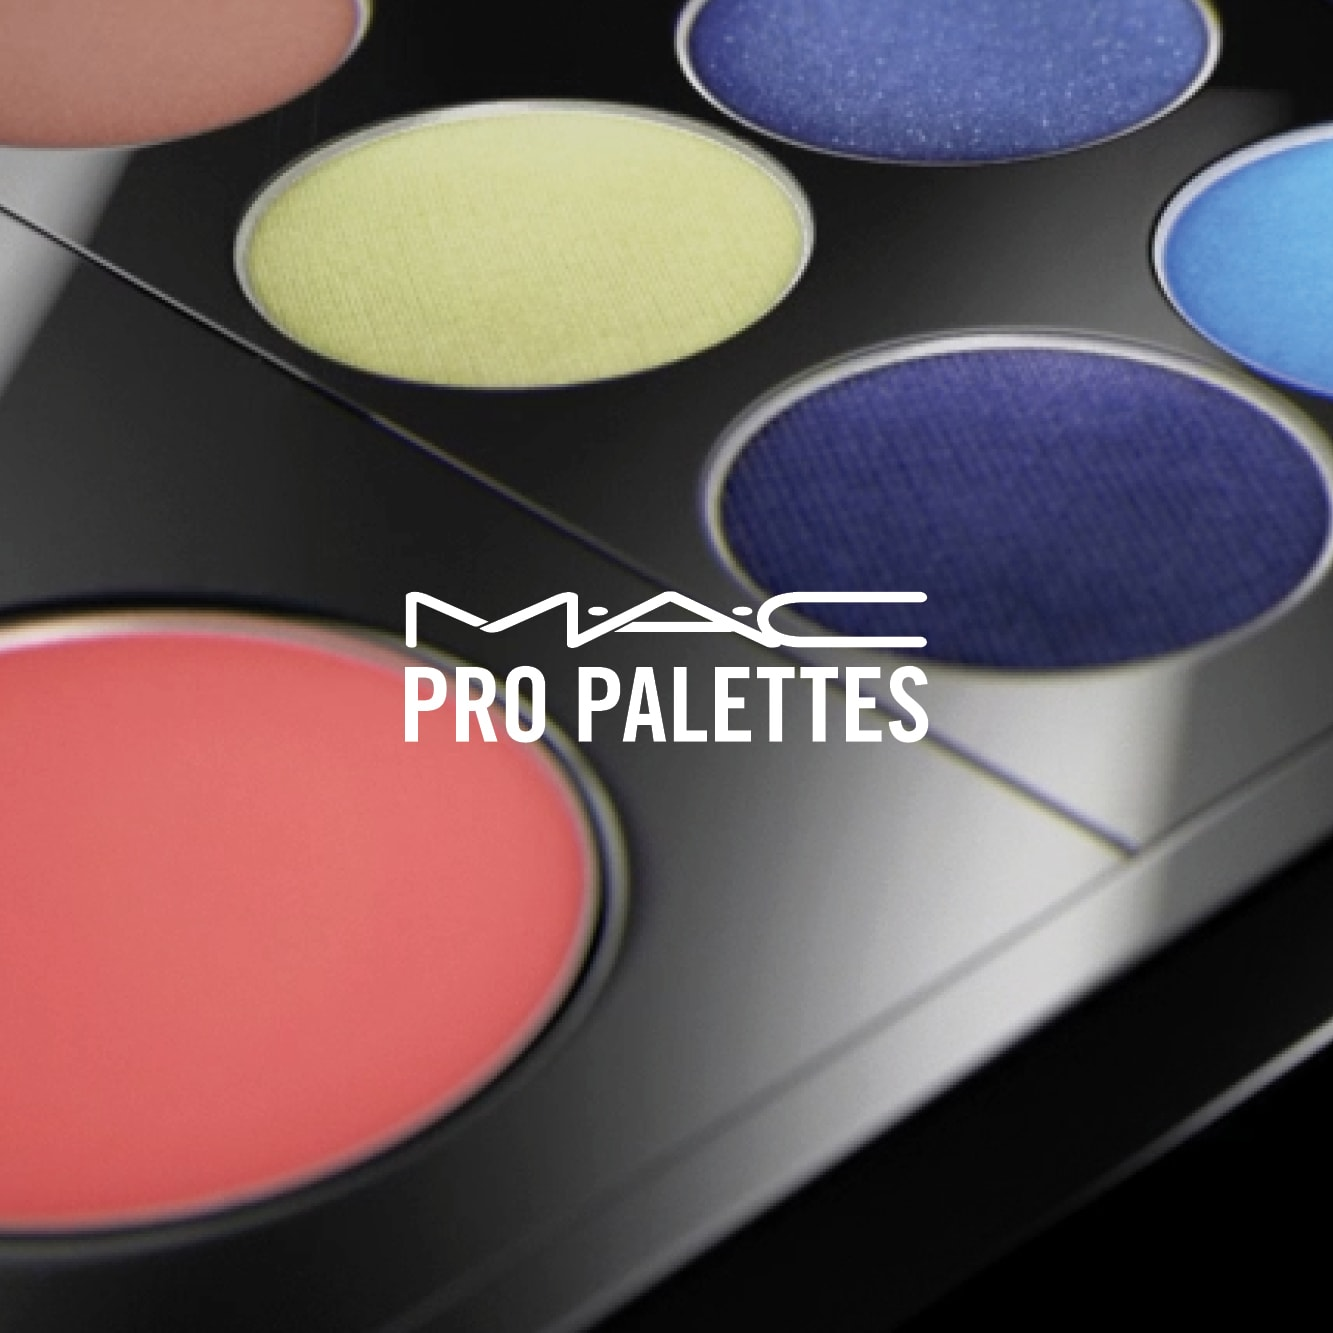 MAC Custom Palettes - Build Your Own Palette | MAC Cosmetics